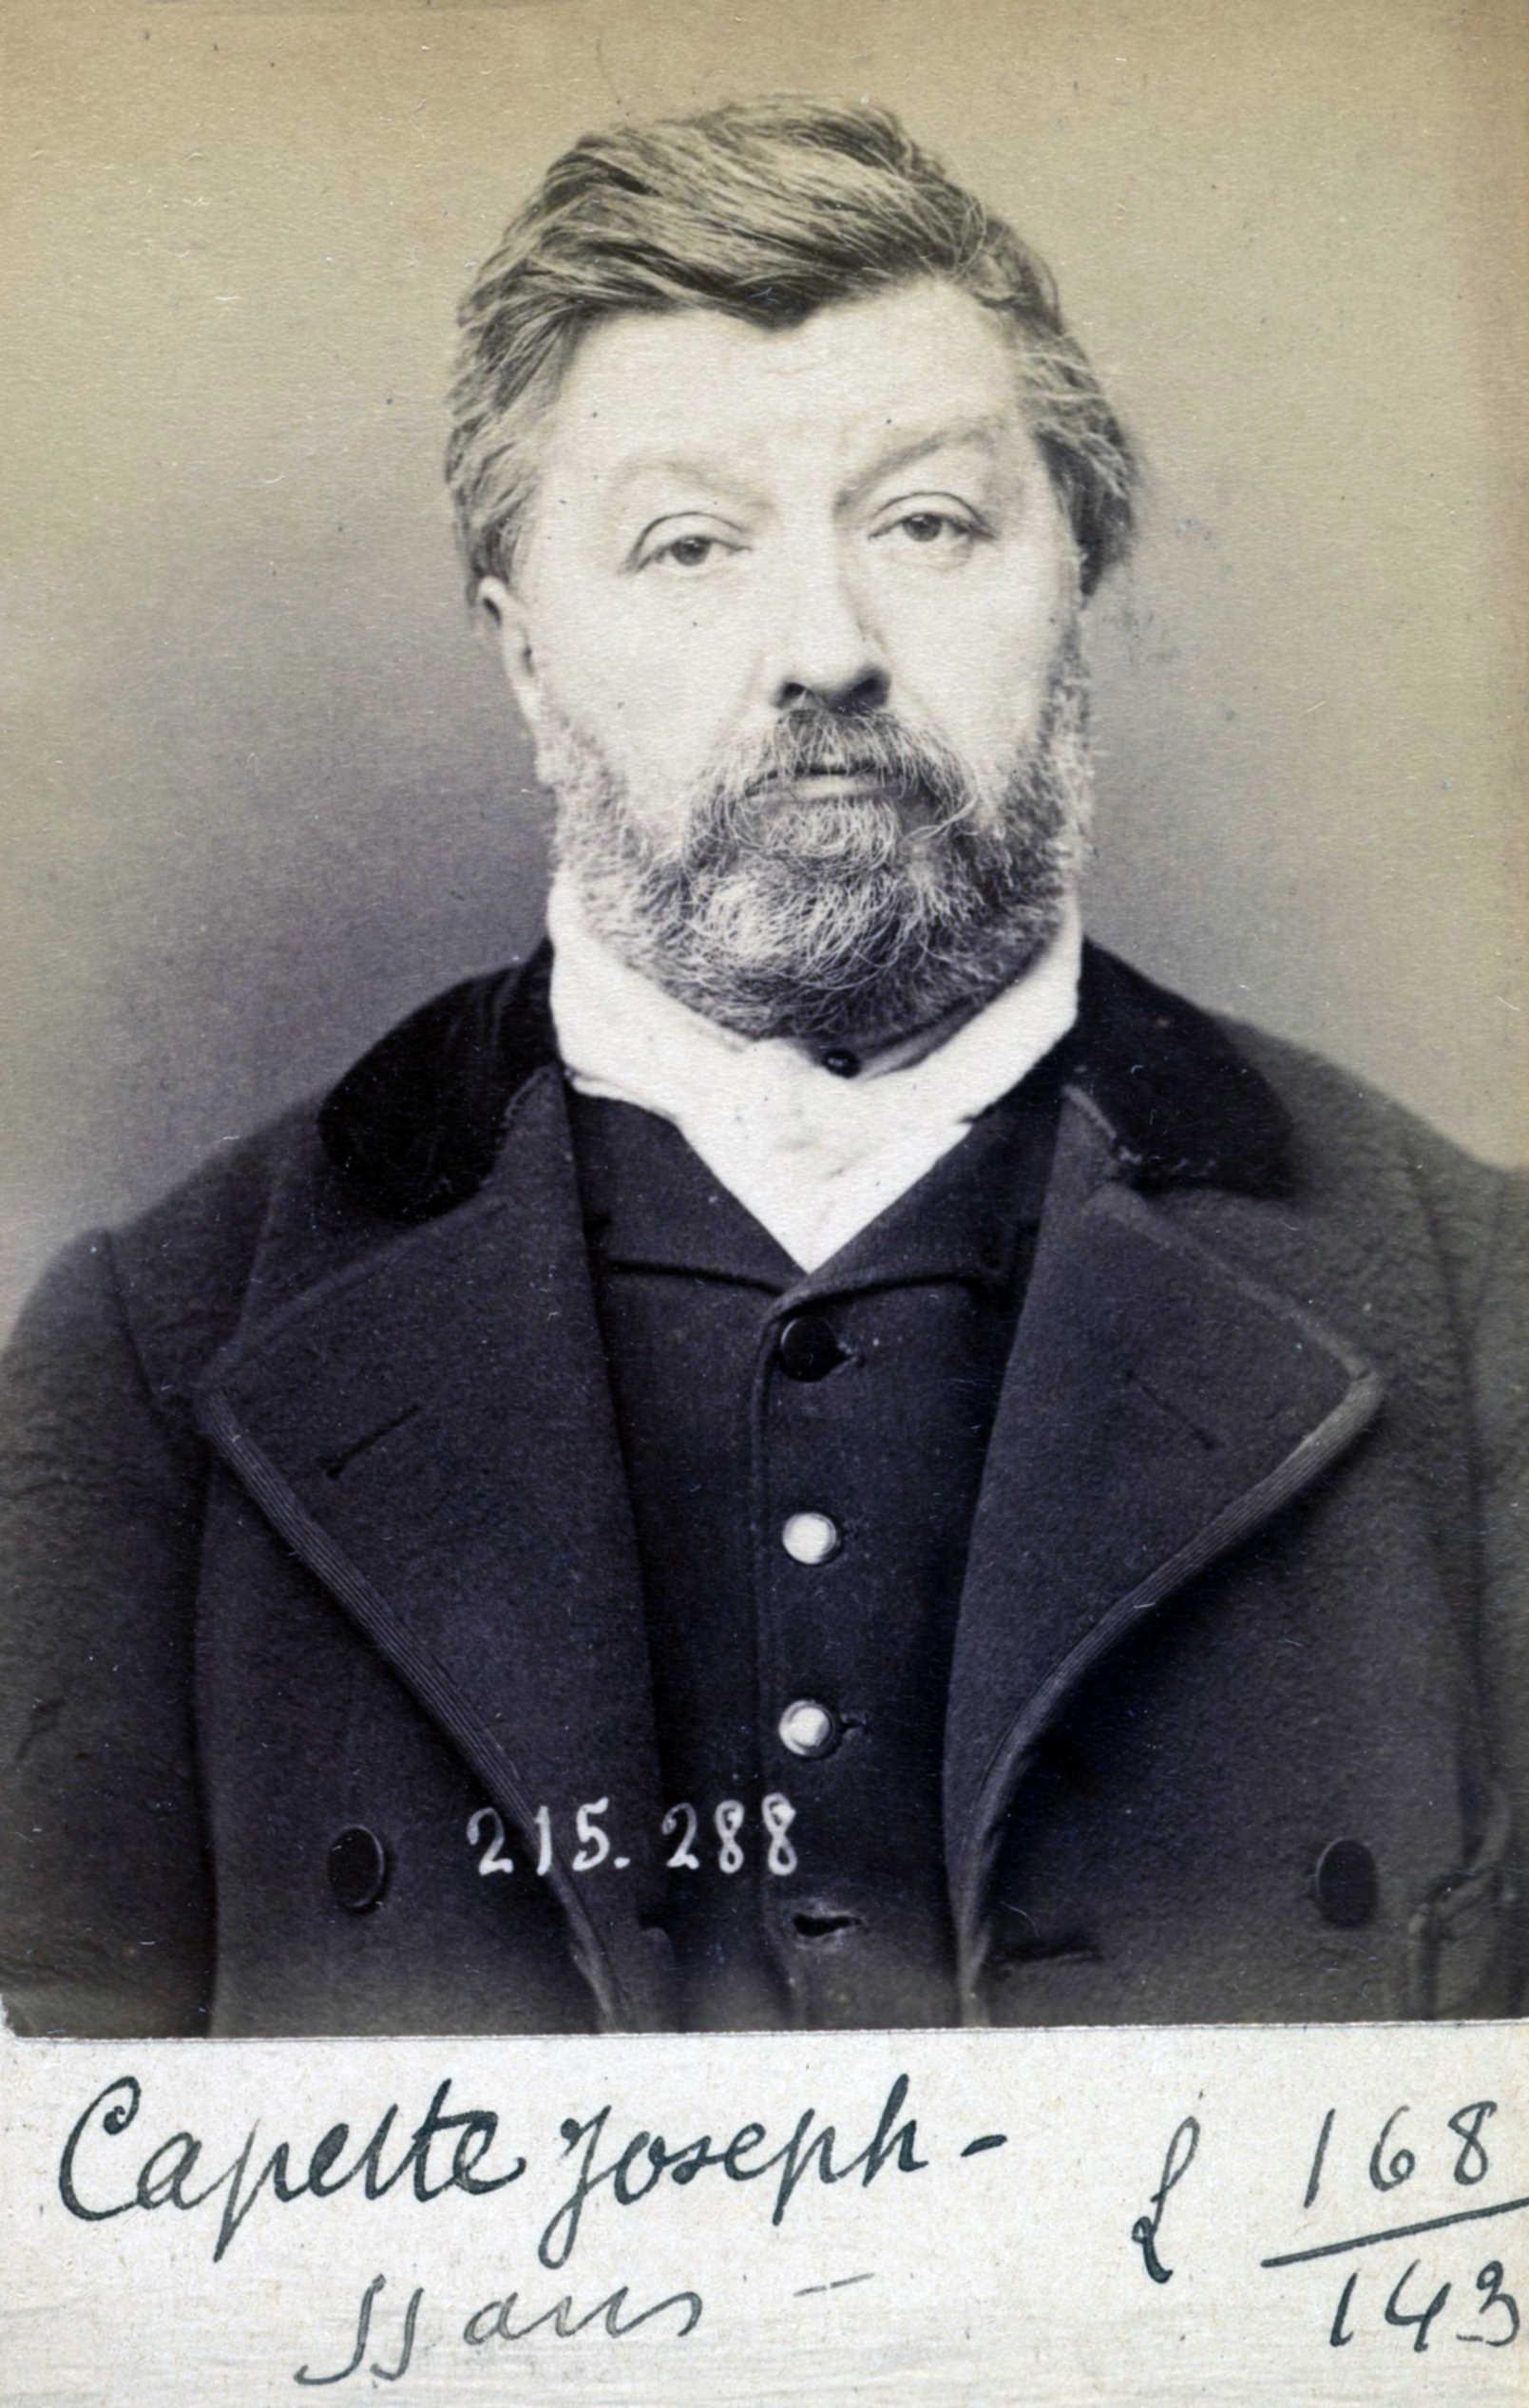 Foto policíaca de Joseph Capette (7 de març de 1894)